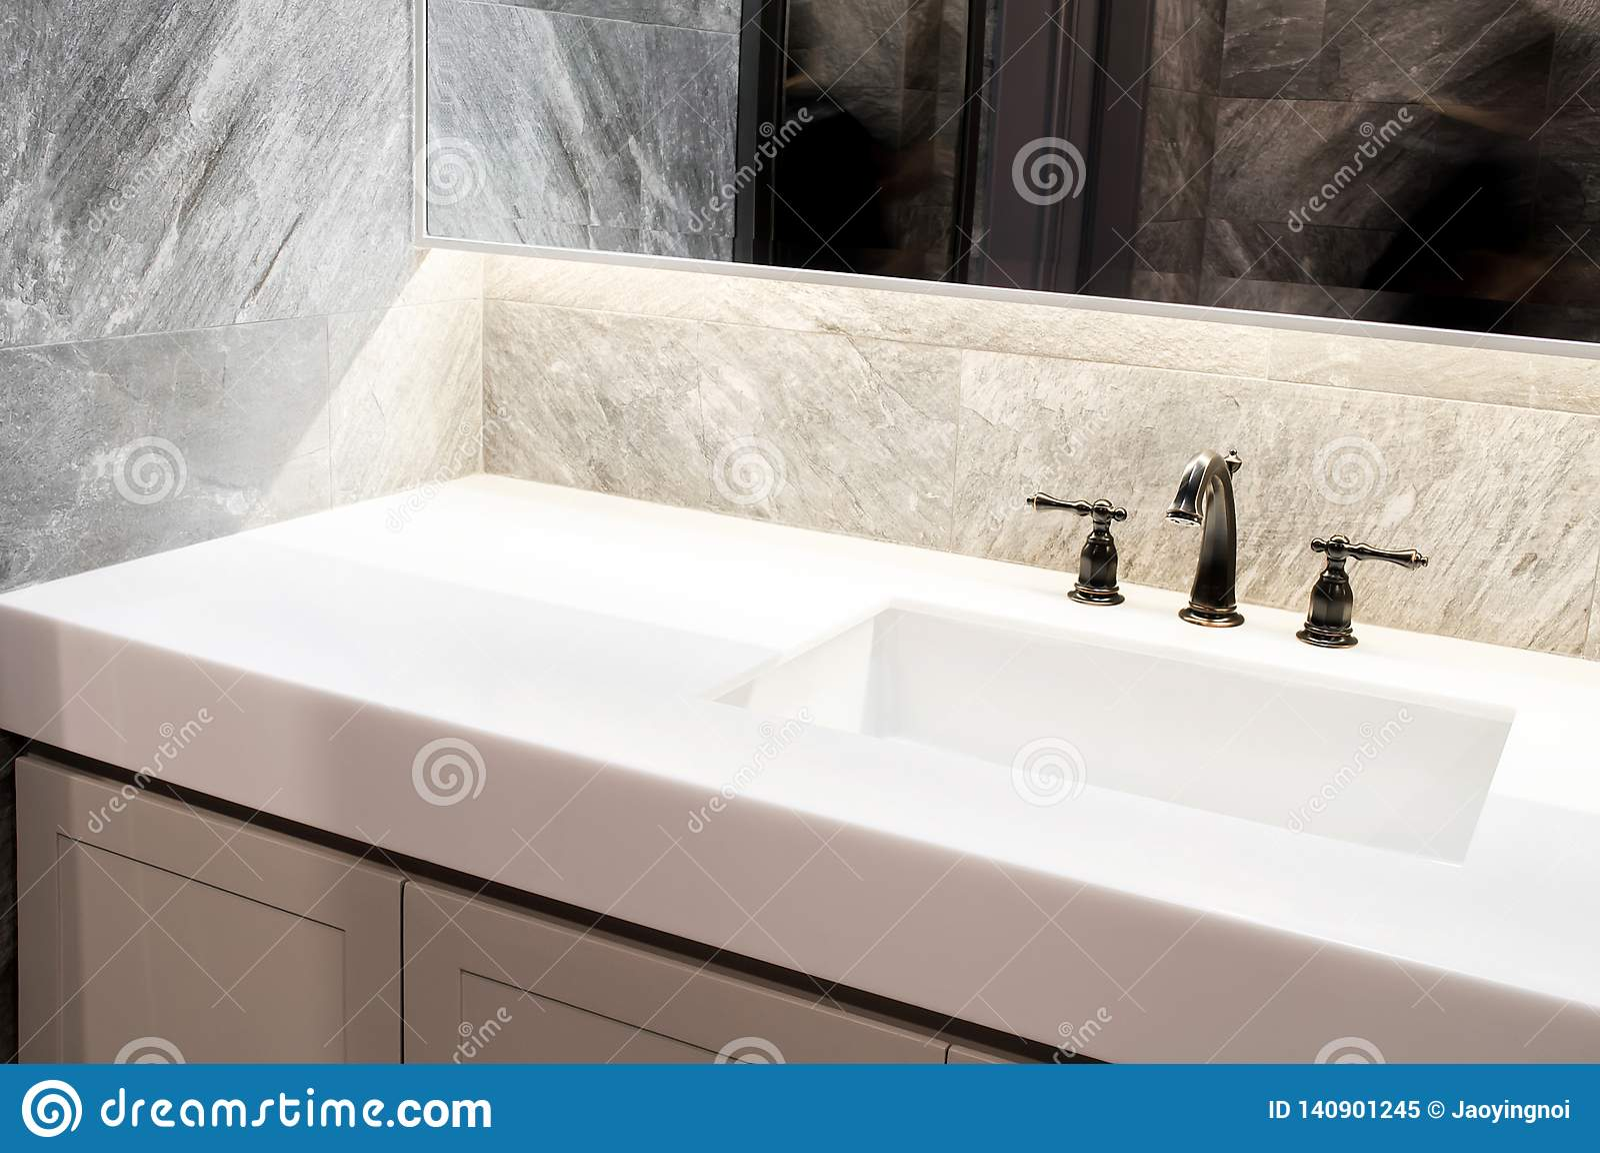 Plan De Travail Granit Ou Quartz marbre blanc de plan de travail, quartz avec le lavabo beige